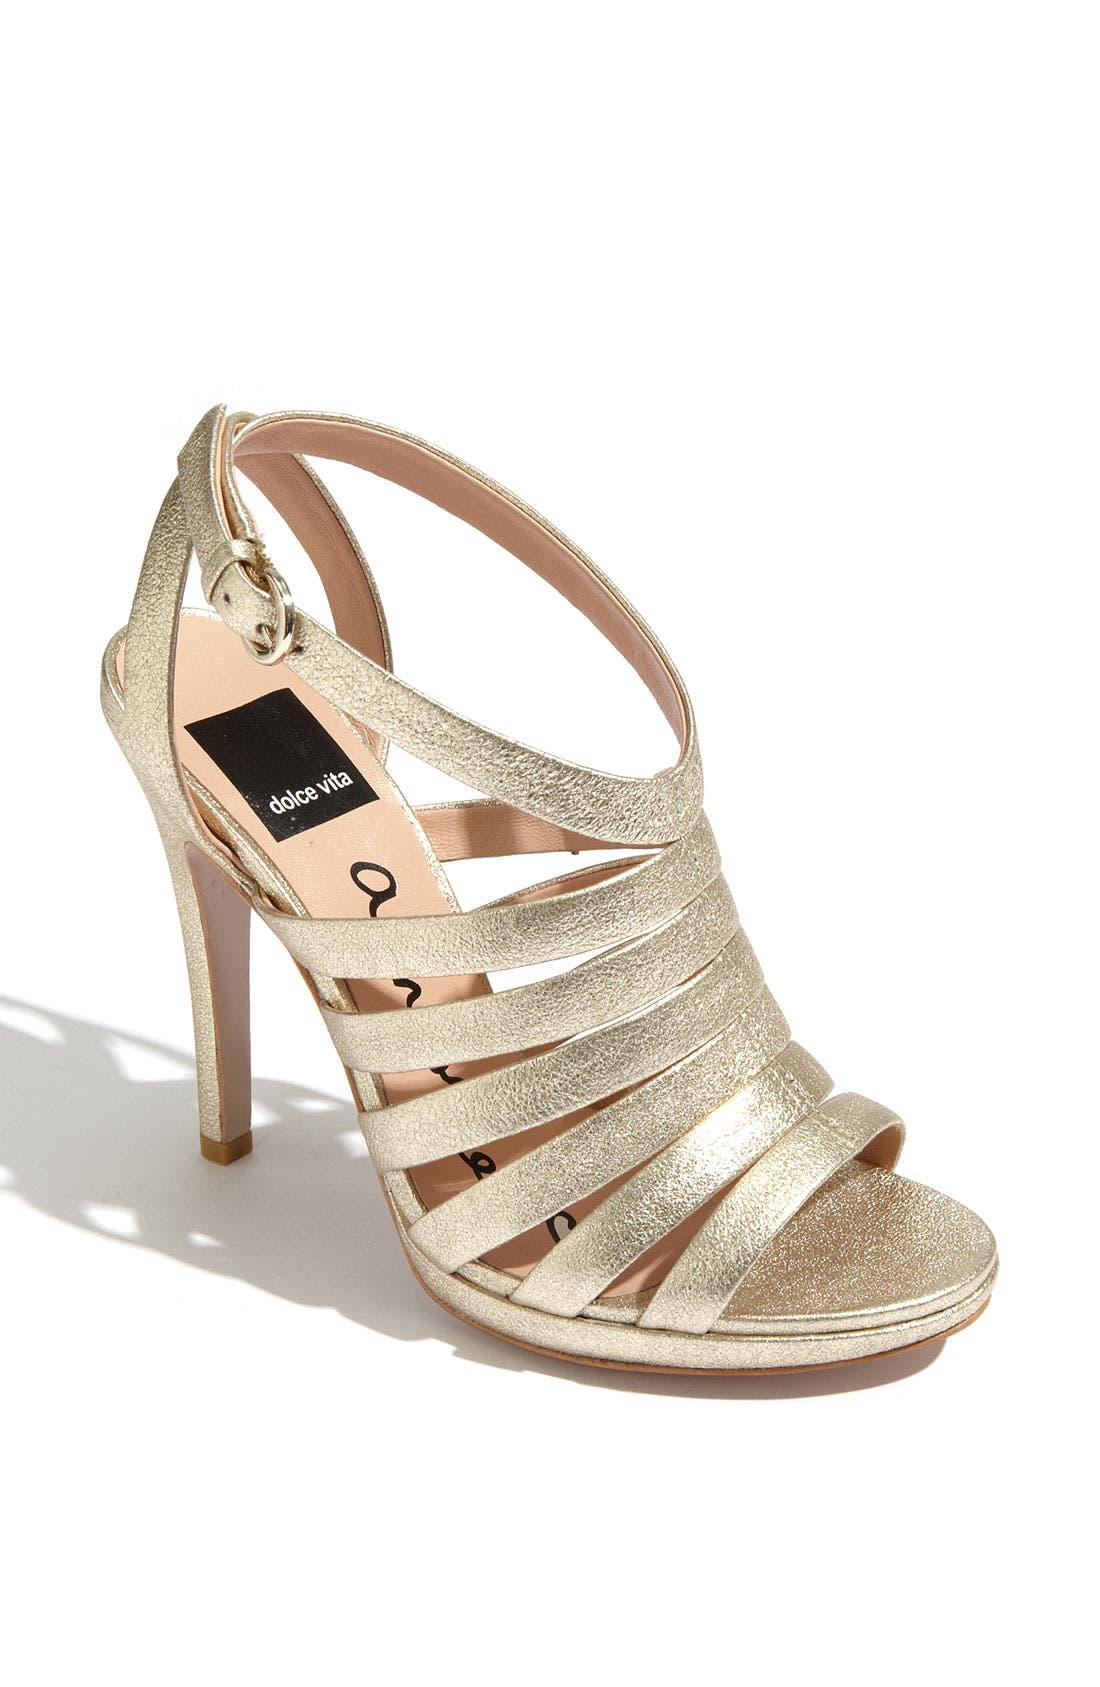 Alternate Image 1 Selected - Dolce Vita 'Riso' Sandal